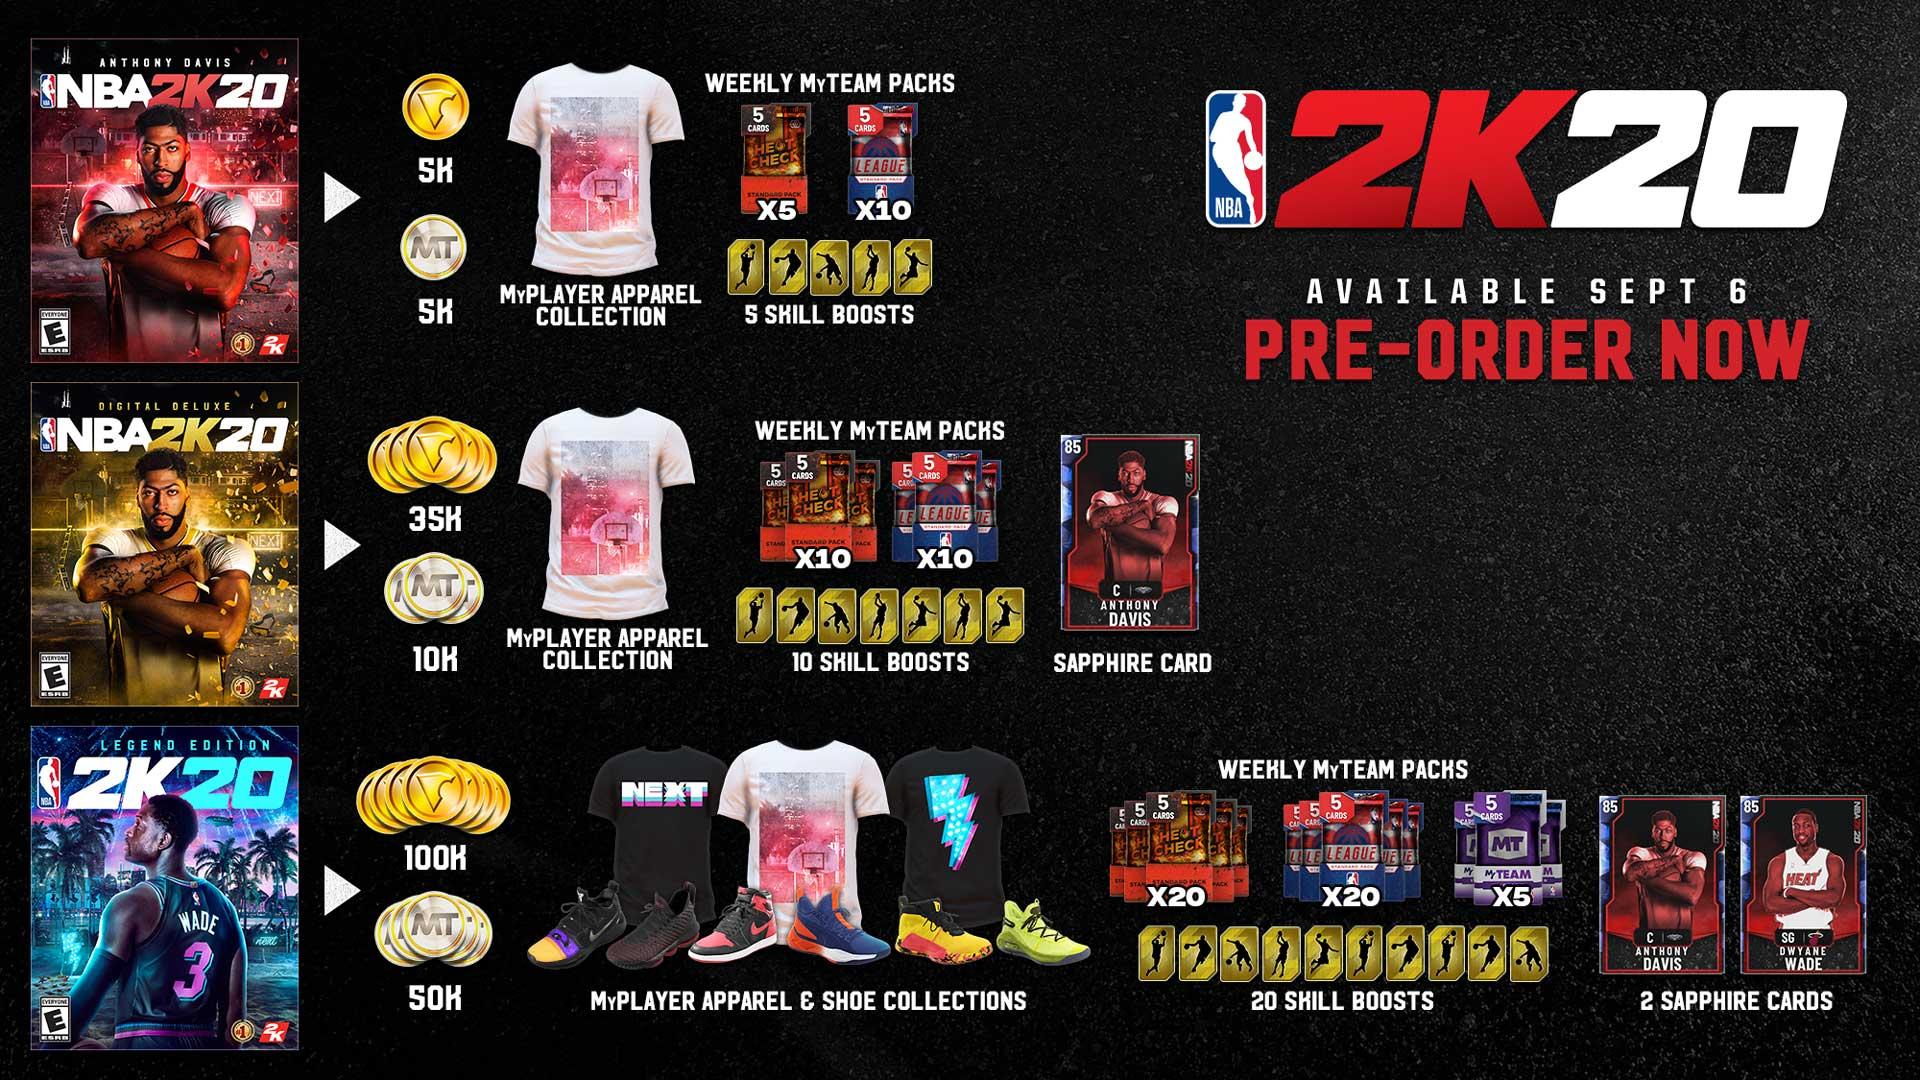 NBA 2K20 editions